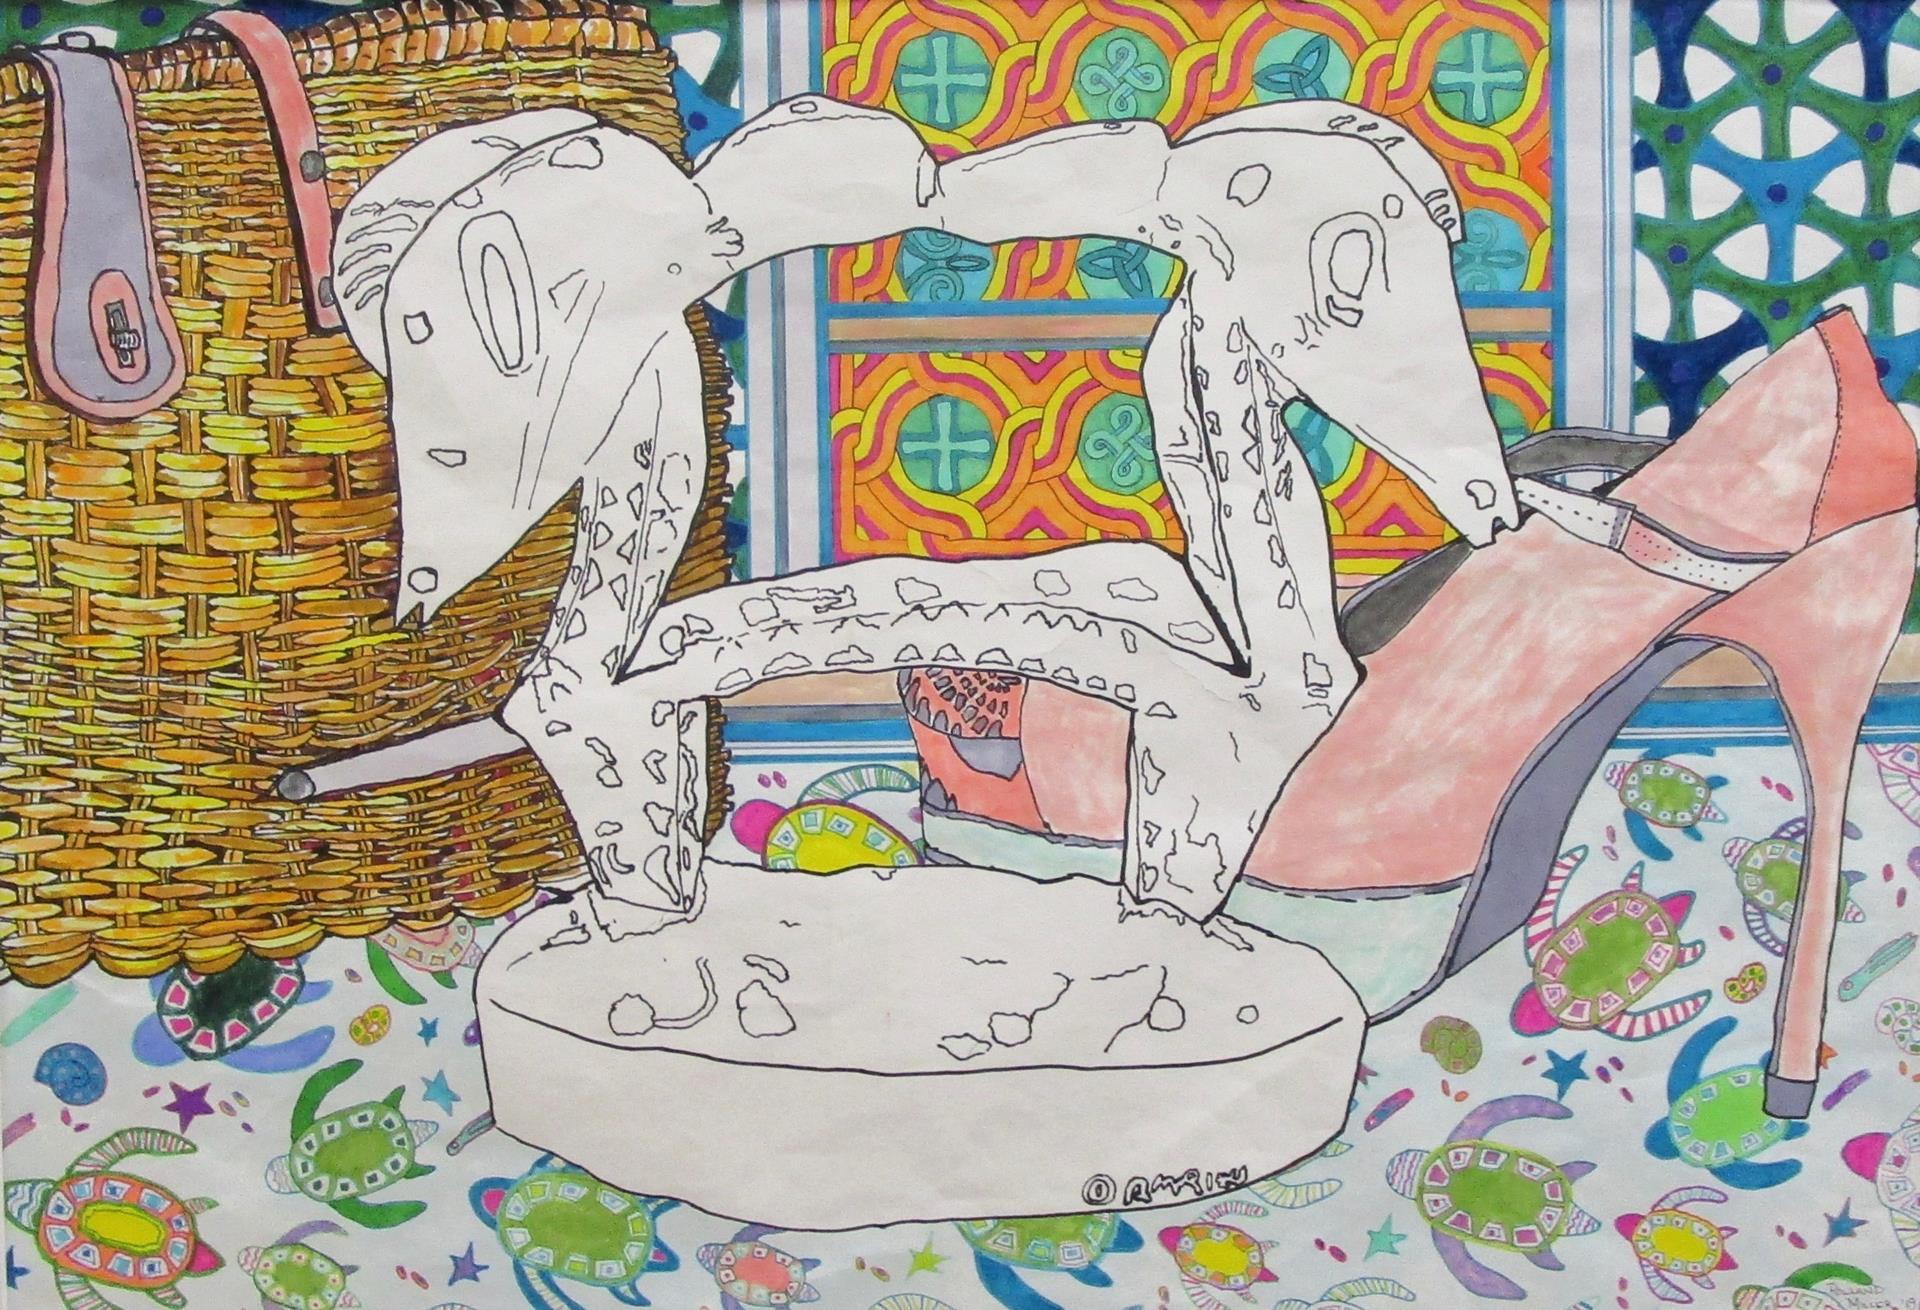 Rolland Miller artwork